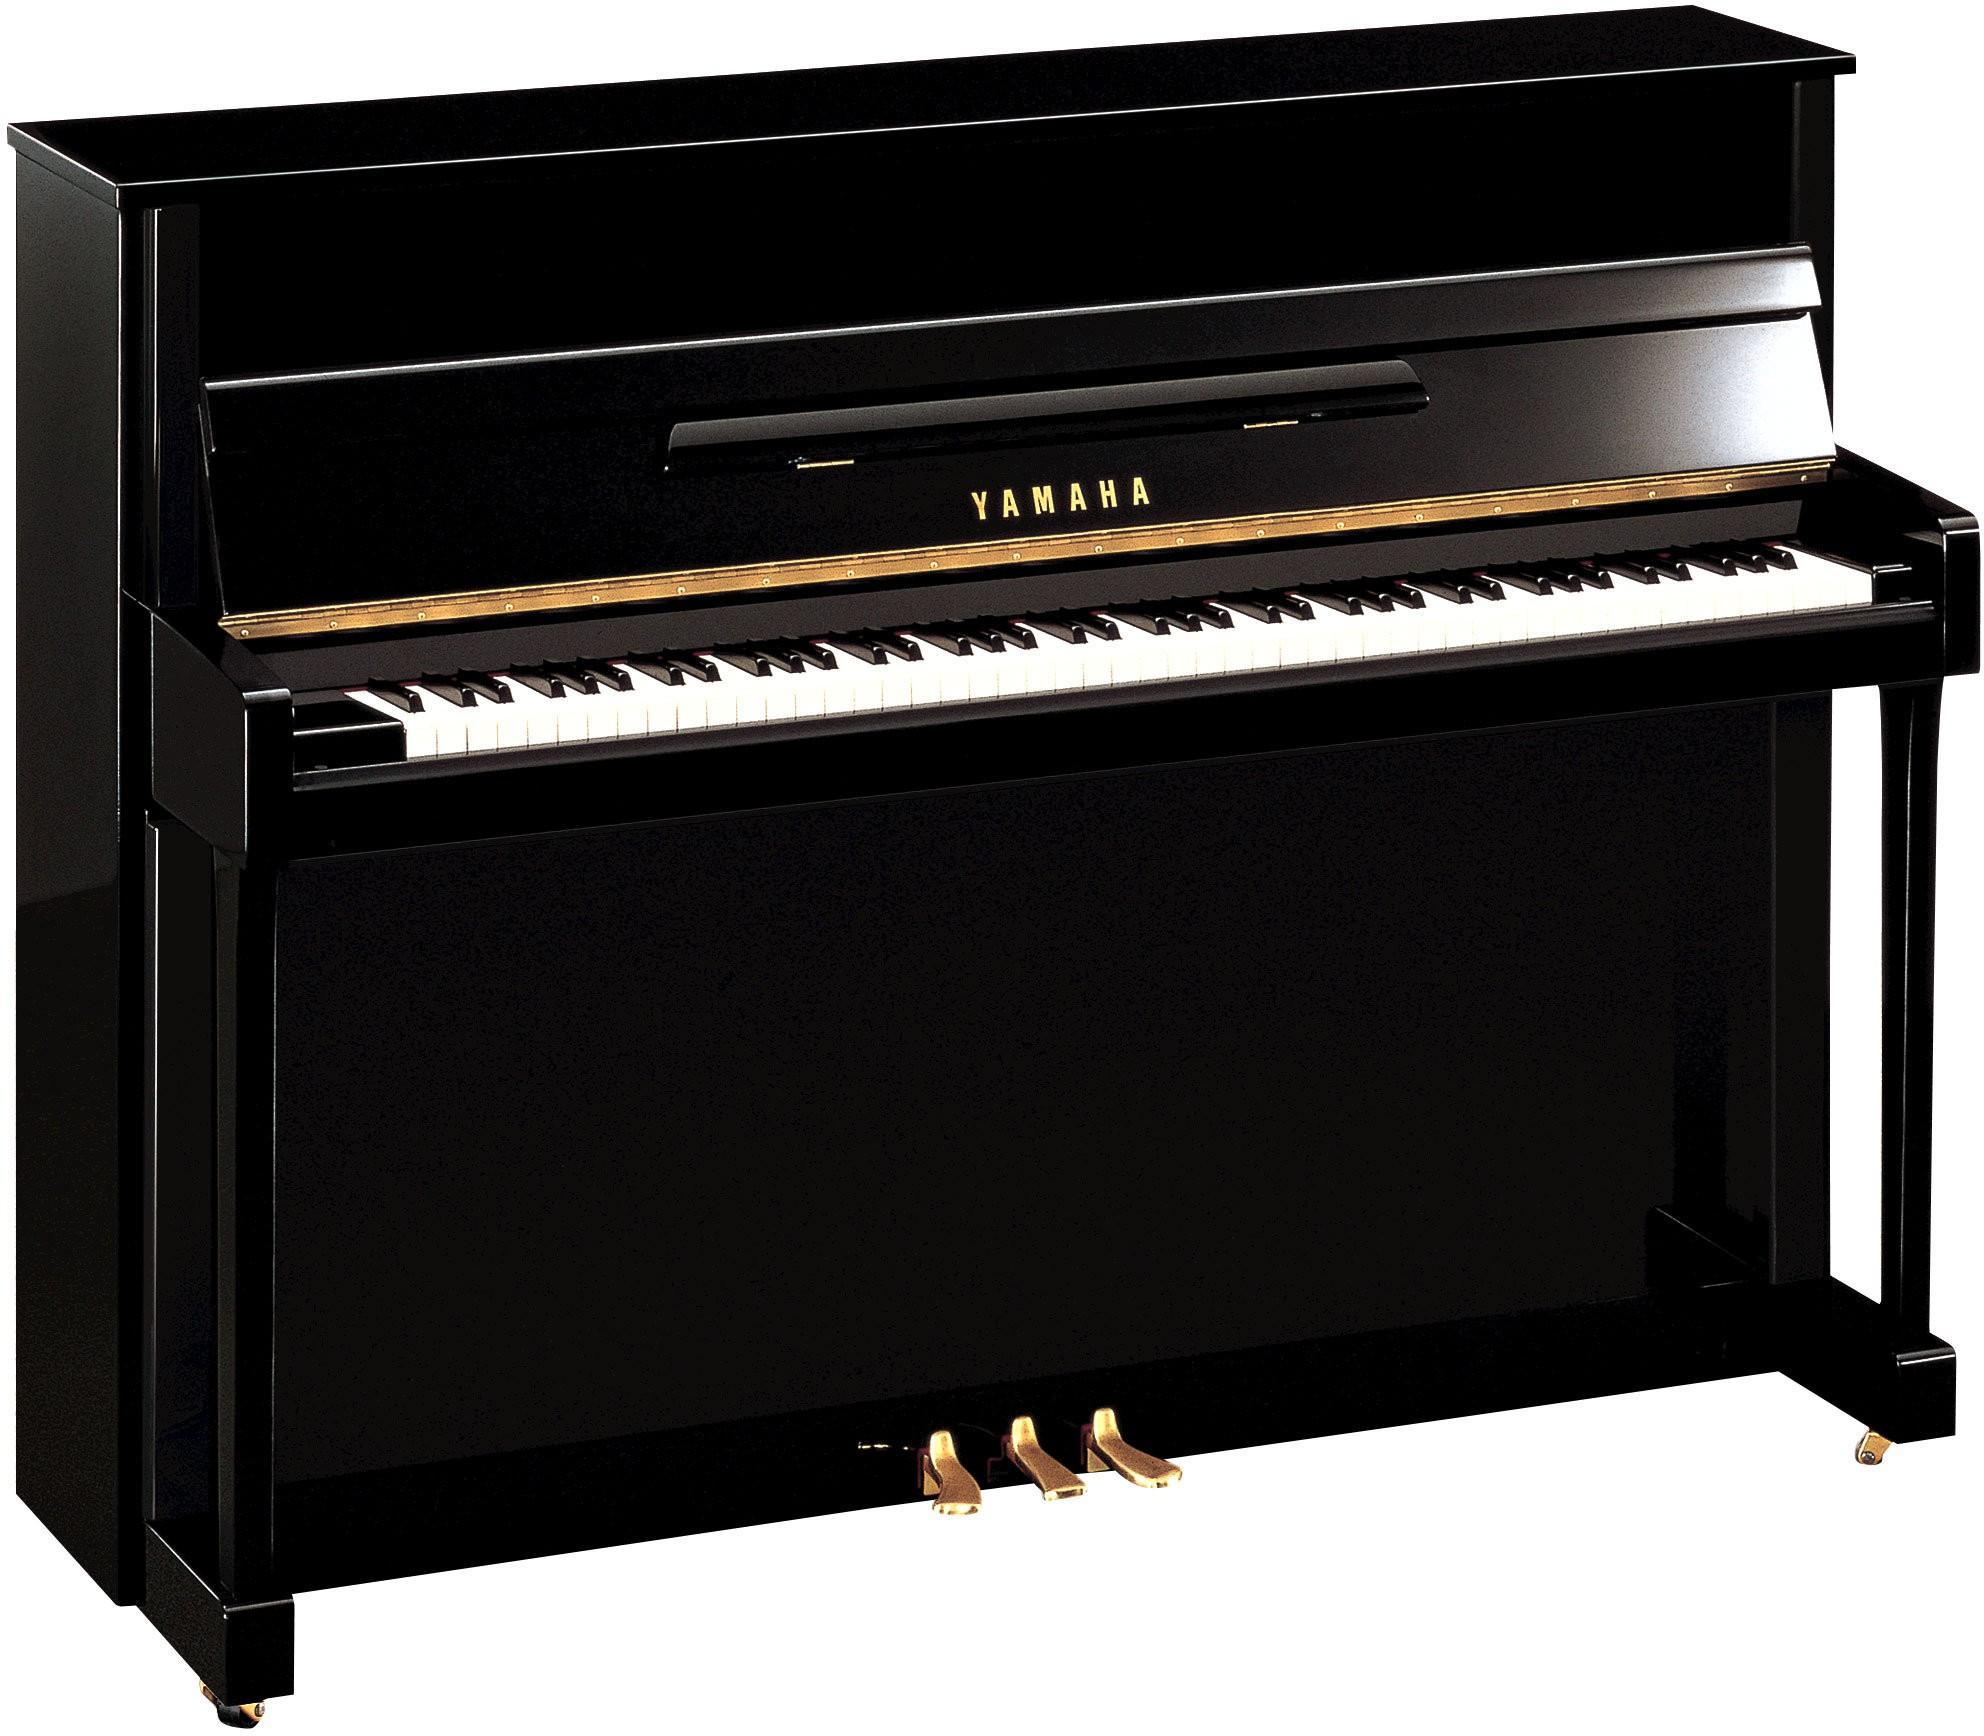 piano yamaha b2 blanc option silent le pianiste. Black Bedroom Furniture Sets. Home Design Ideas